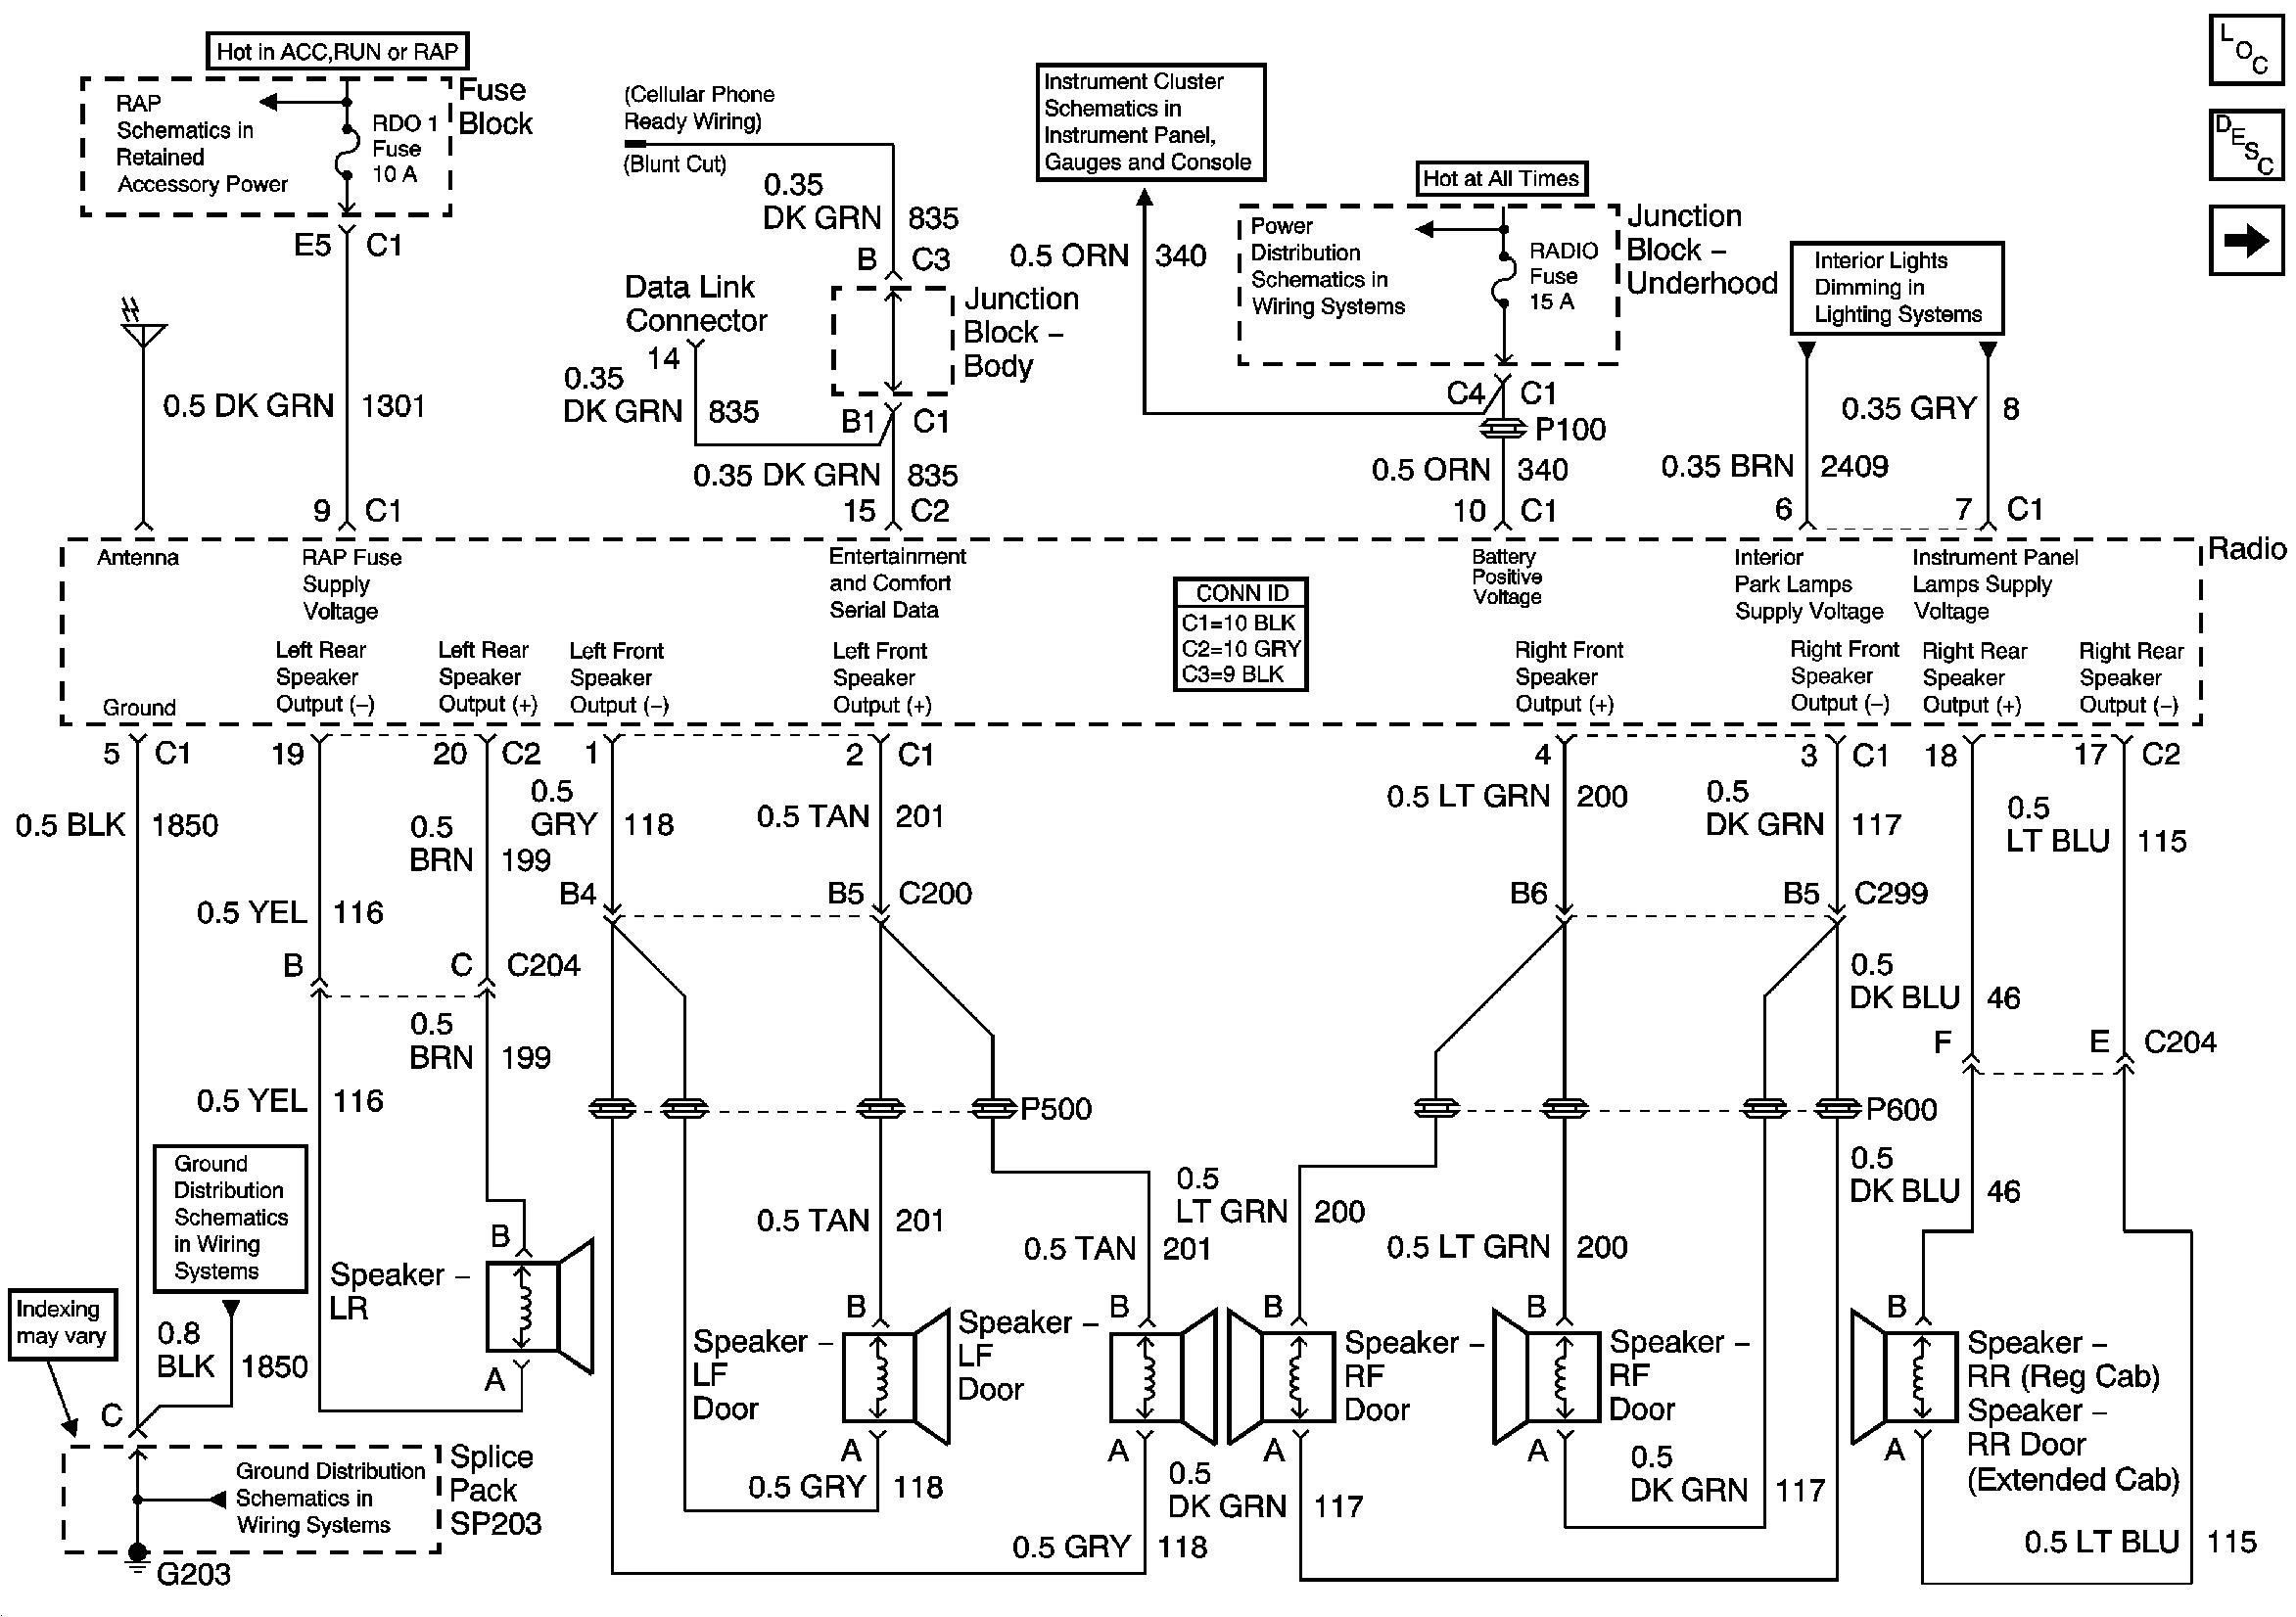 2011 02 25 050614 radio schematic gif